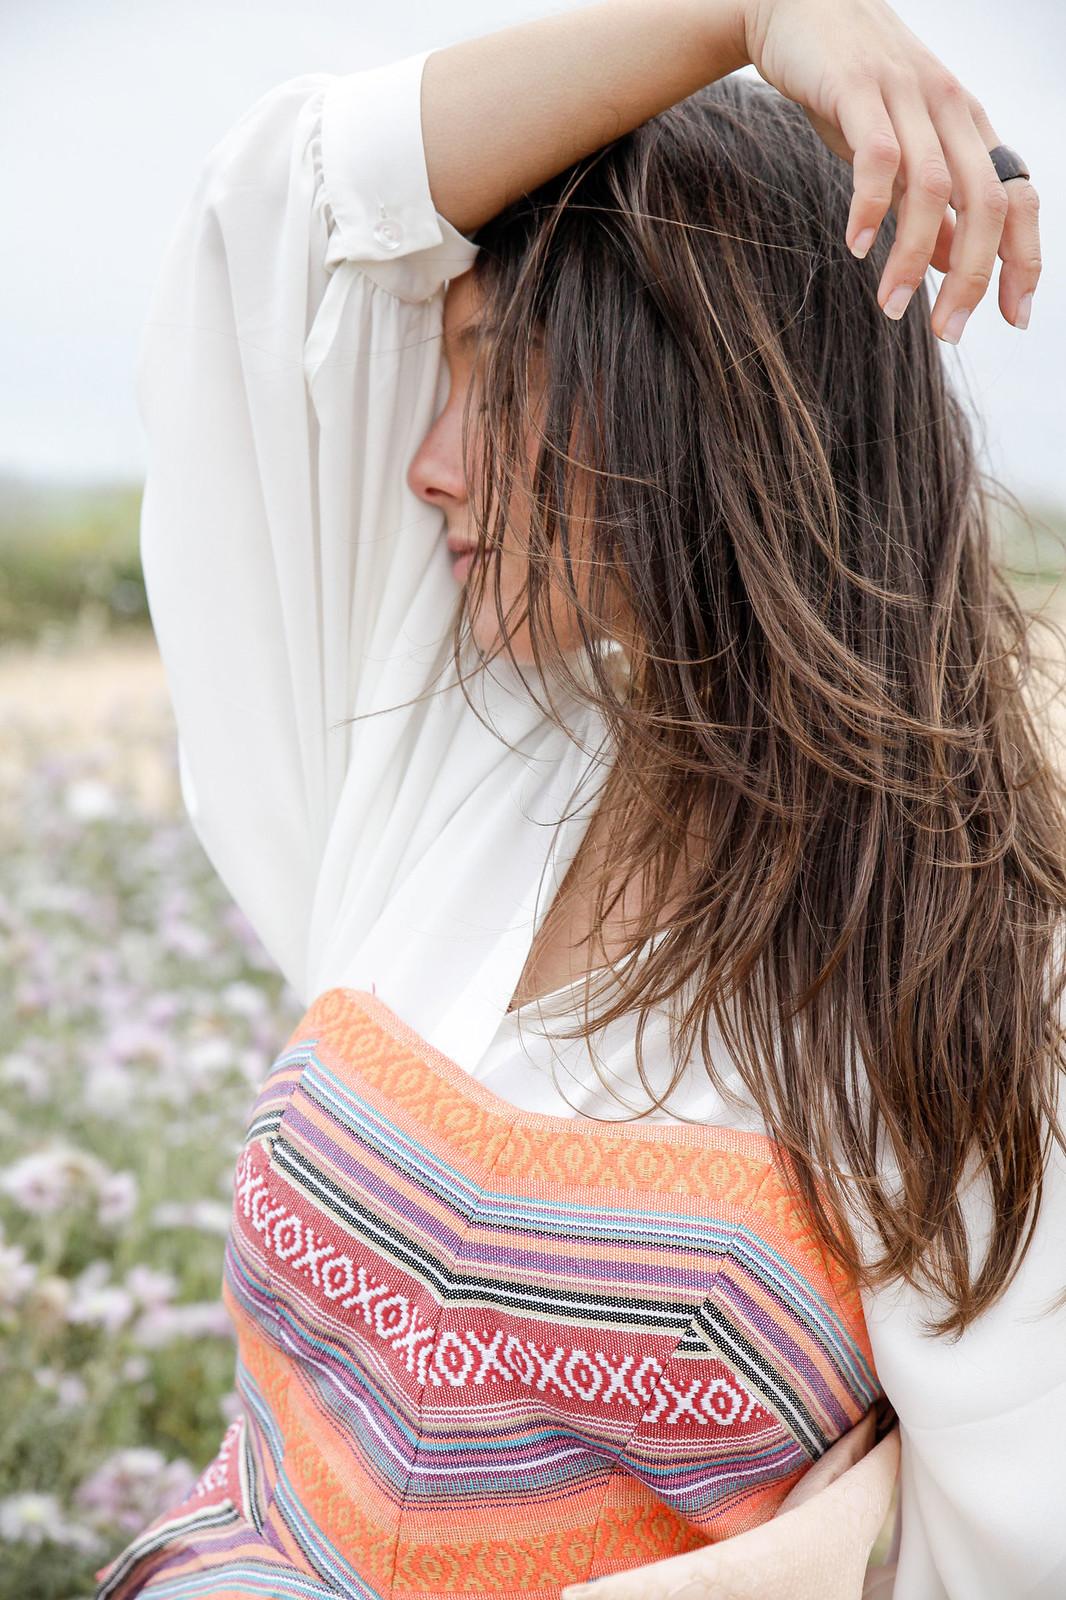 08_corset_etnico_danity_paris_theguestgirl_influencer_barcelona_laura_santolaria